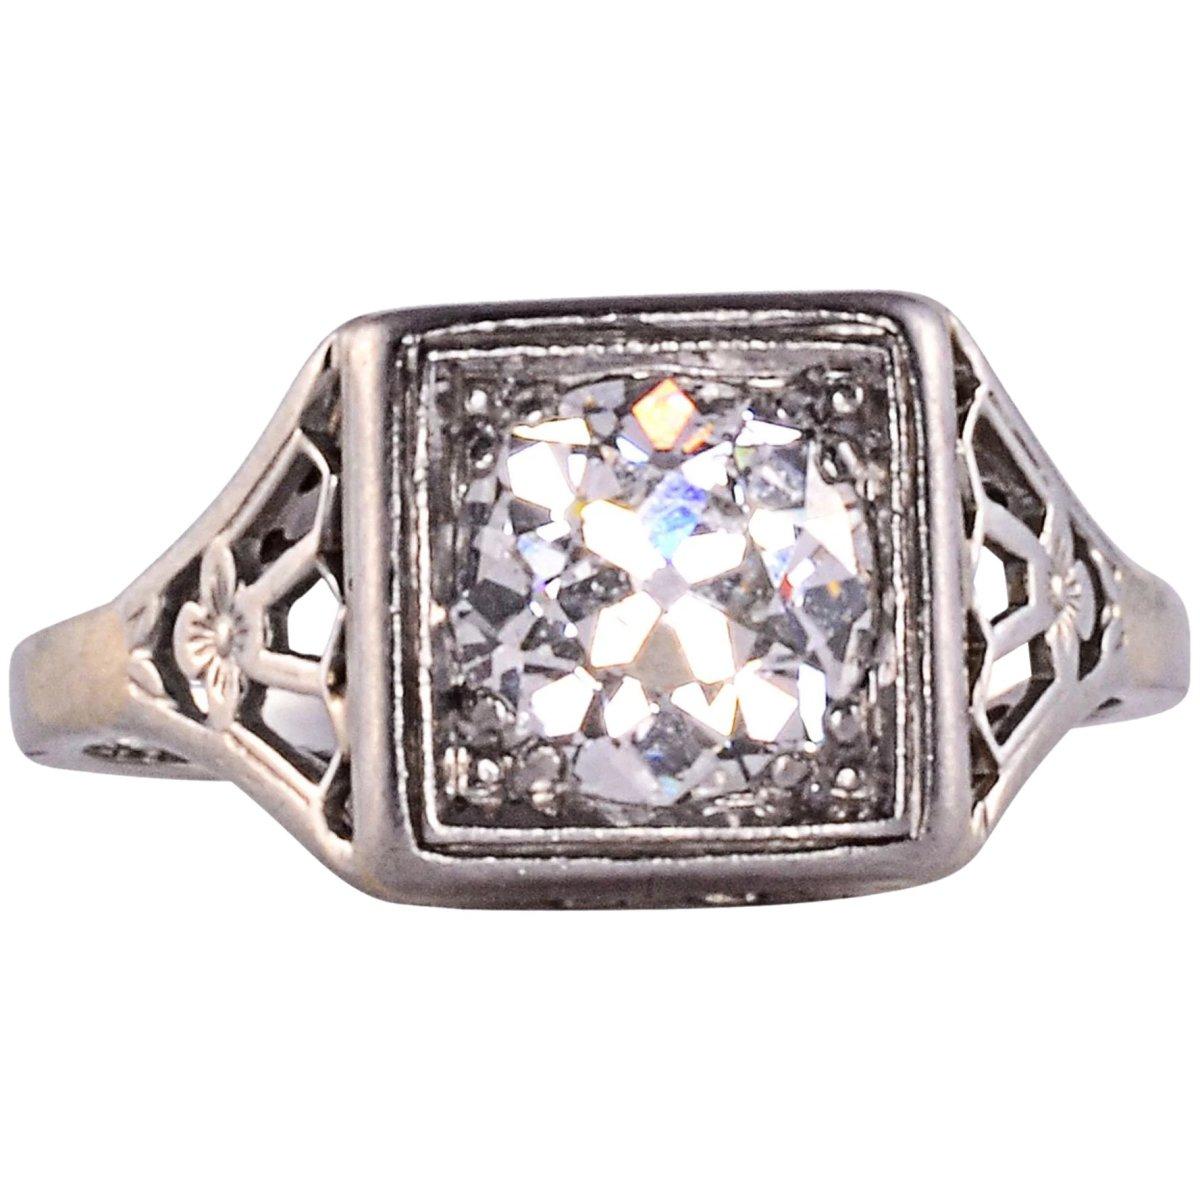 Antique Edwardian platinum and European-cut diamond ring, 1.25 carats, circa 1900, $5,950.